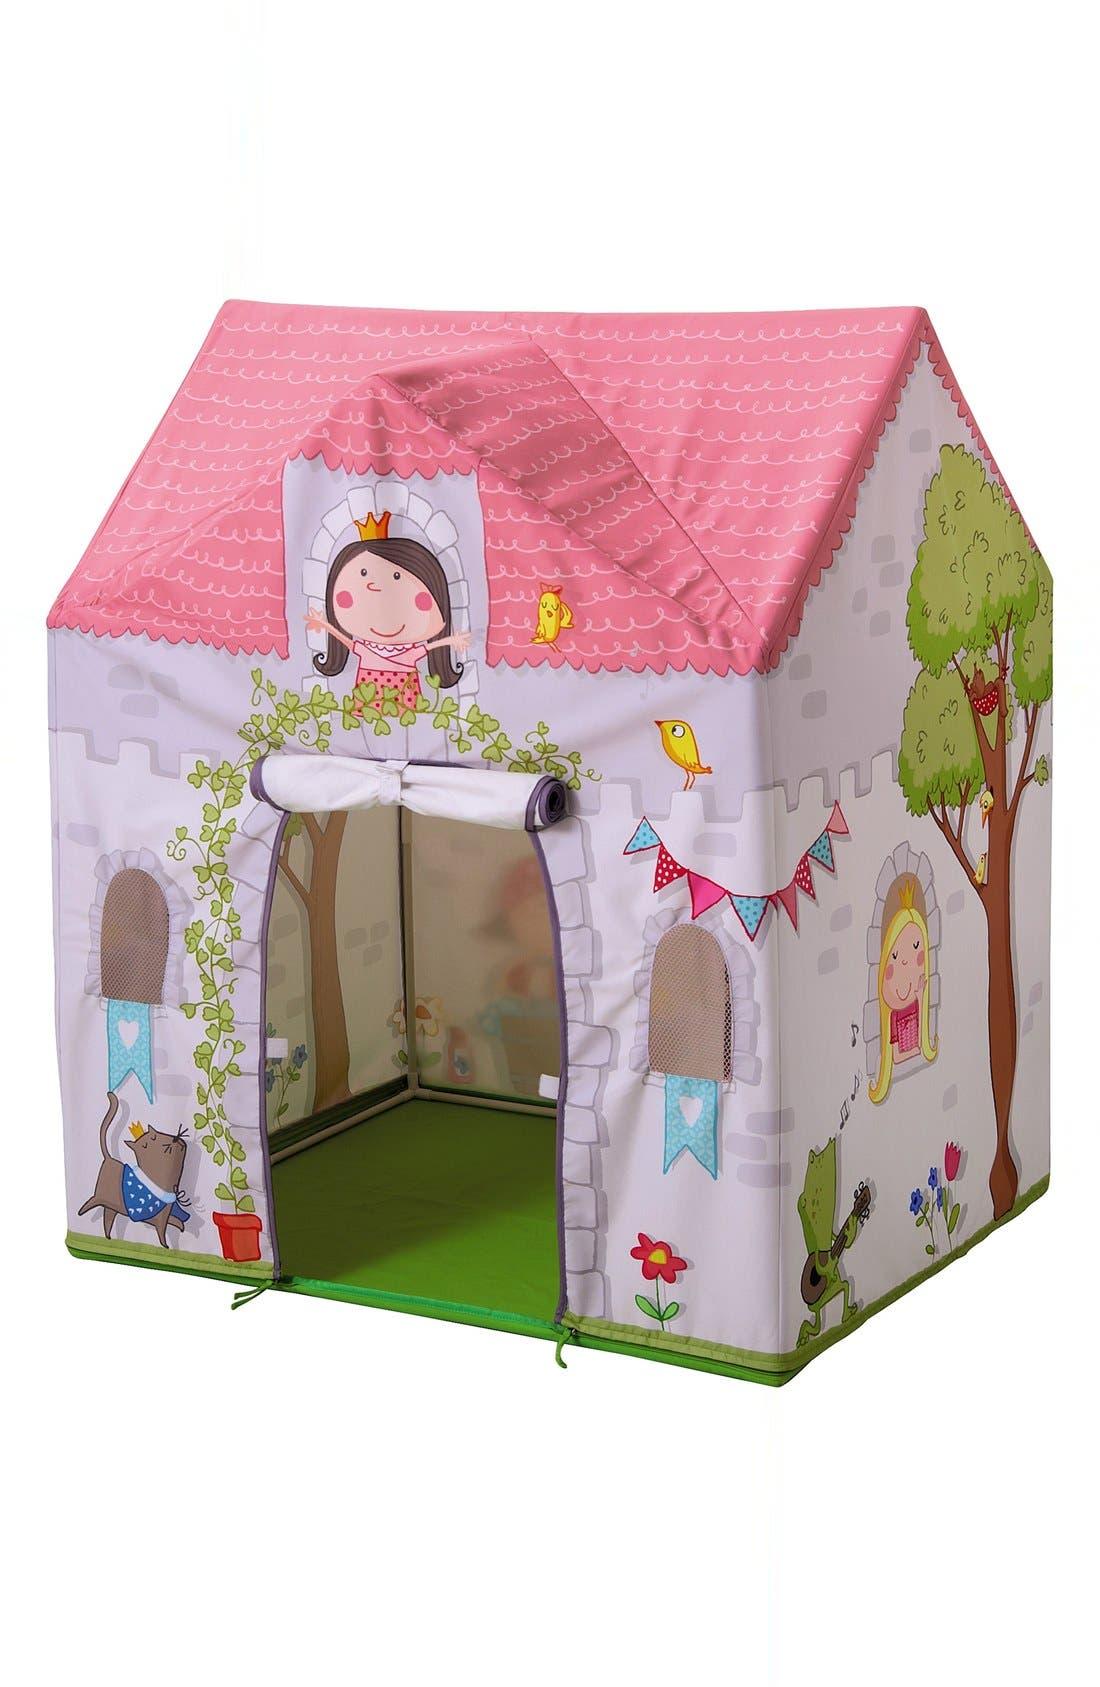 'Princess Rosalina' Play Tent,                         Main,                         color, Pink